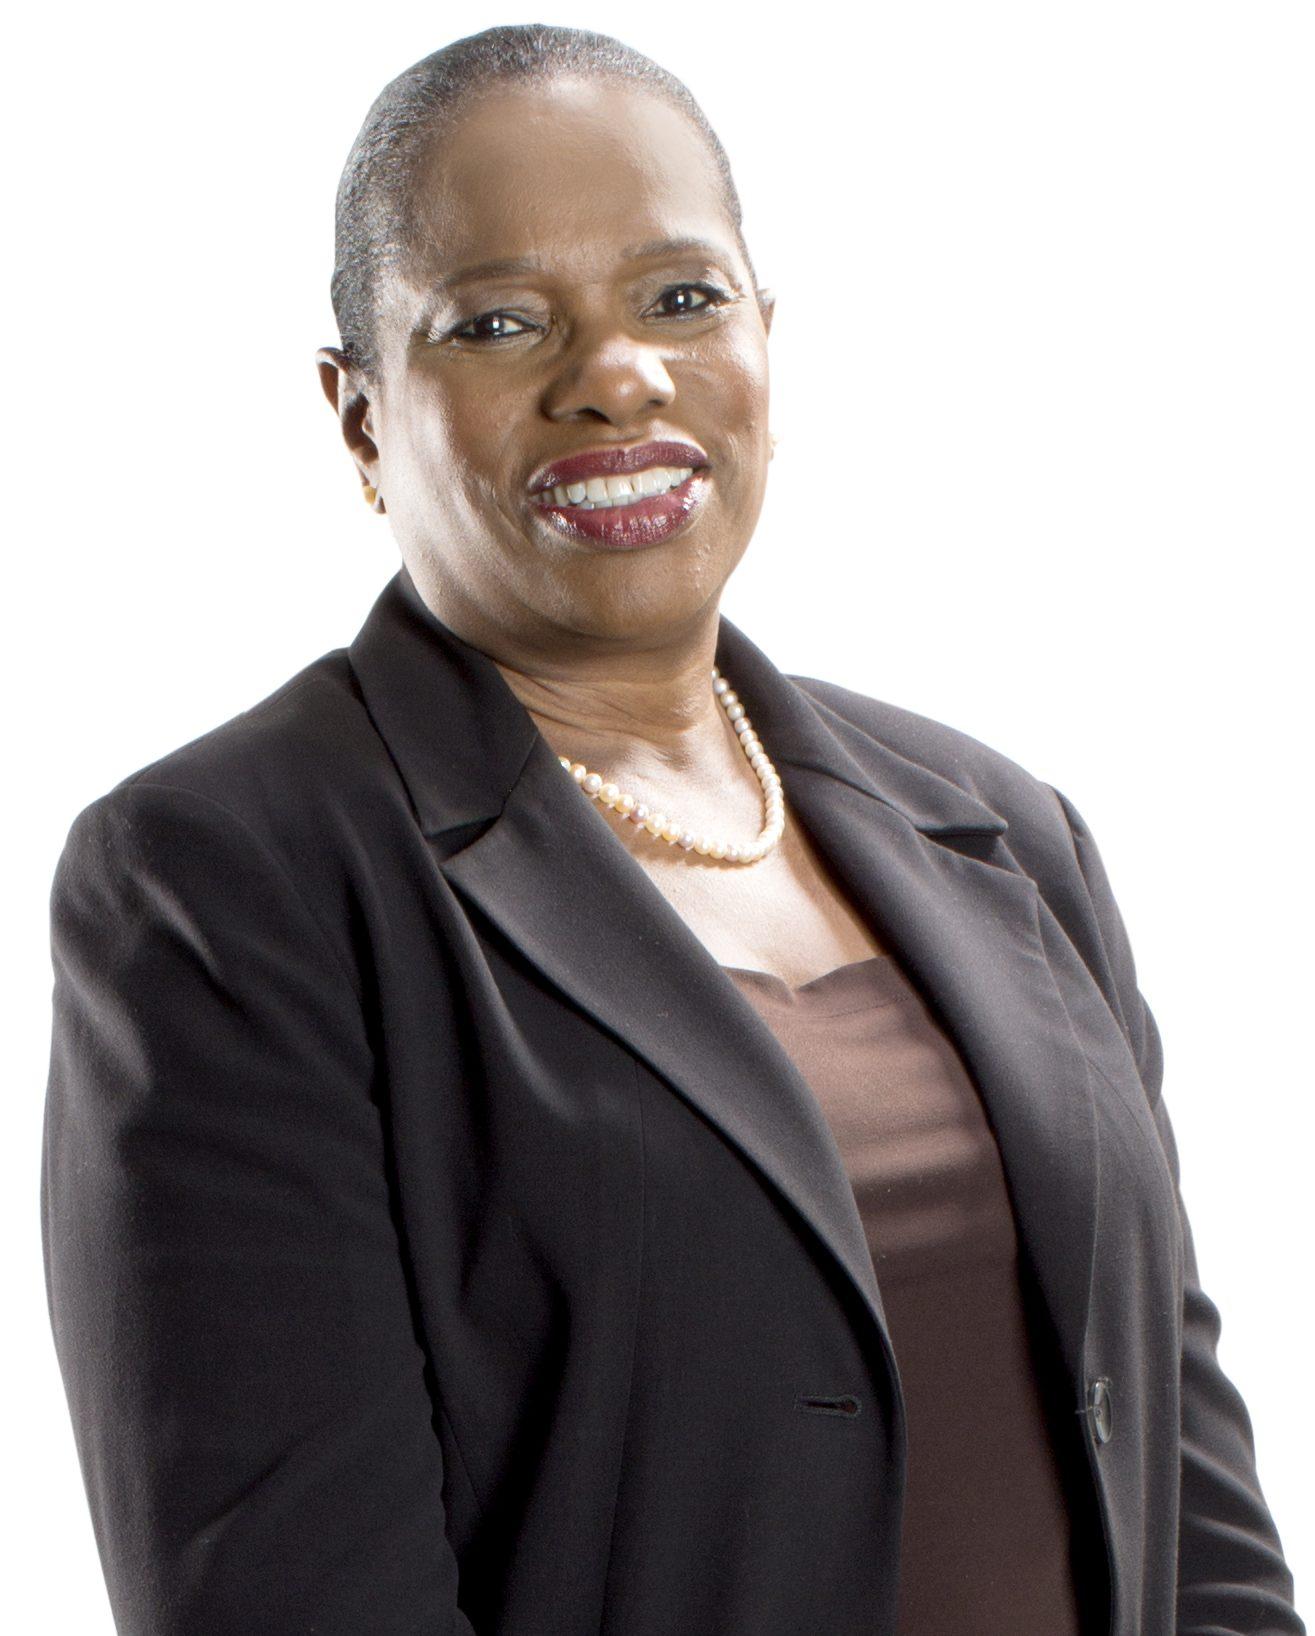 Joy Mitchell-Grant